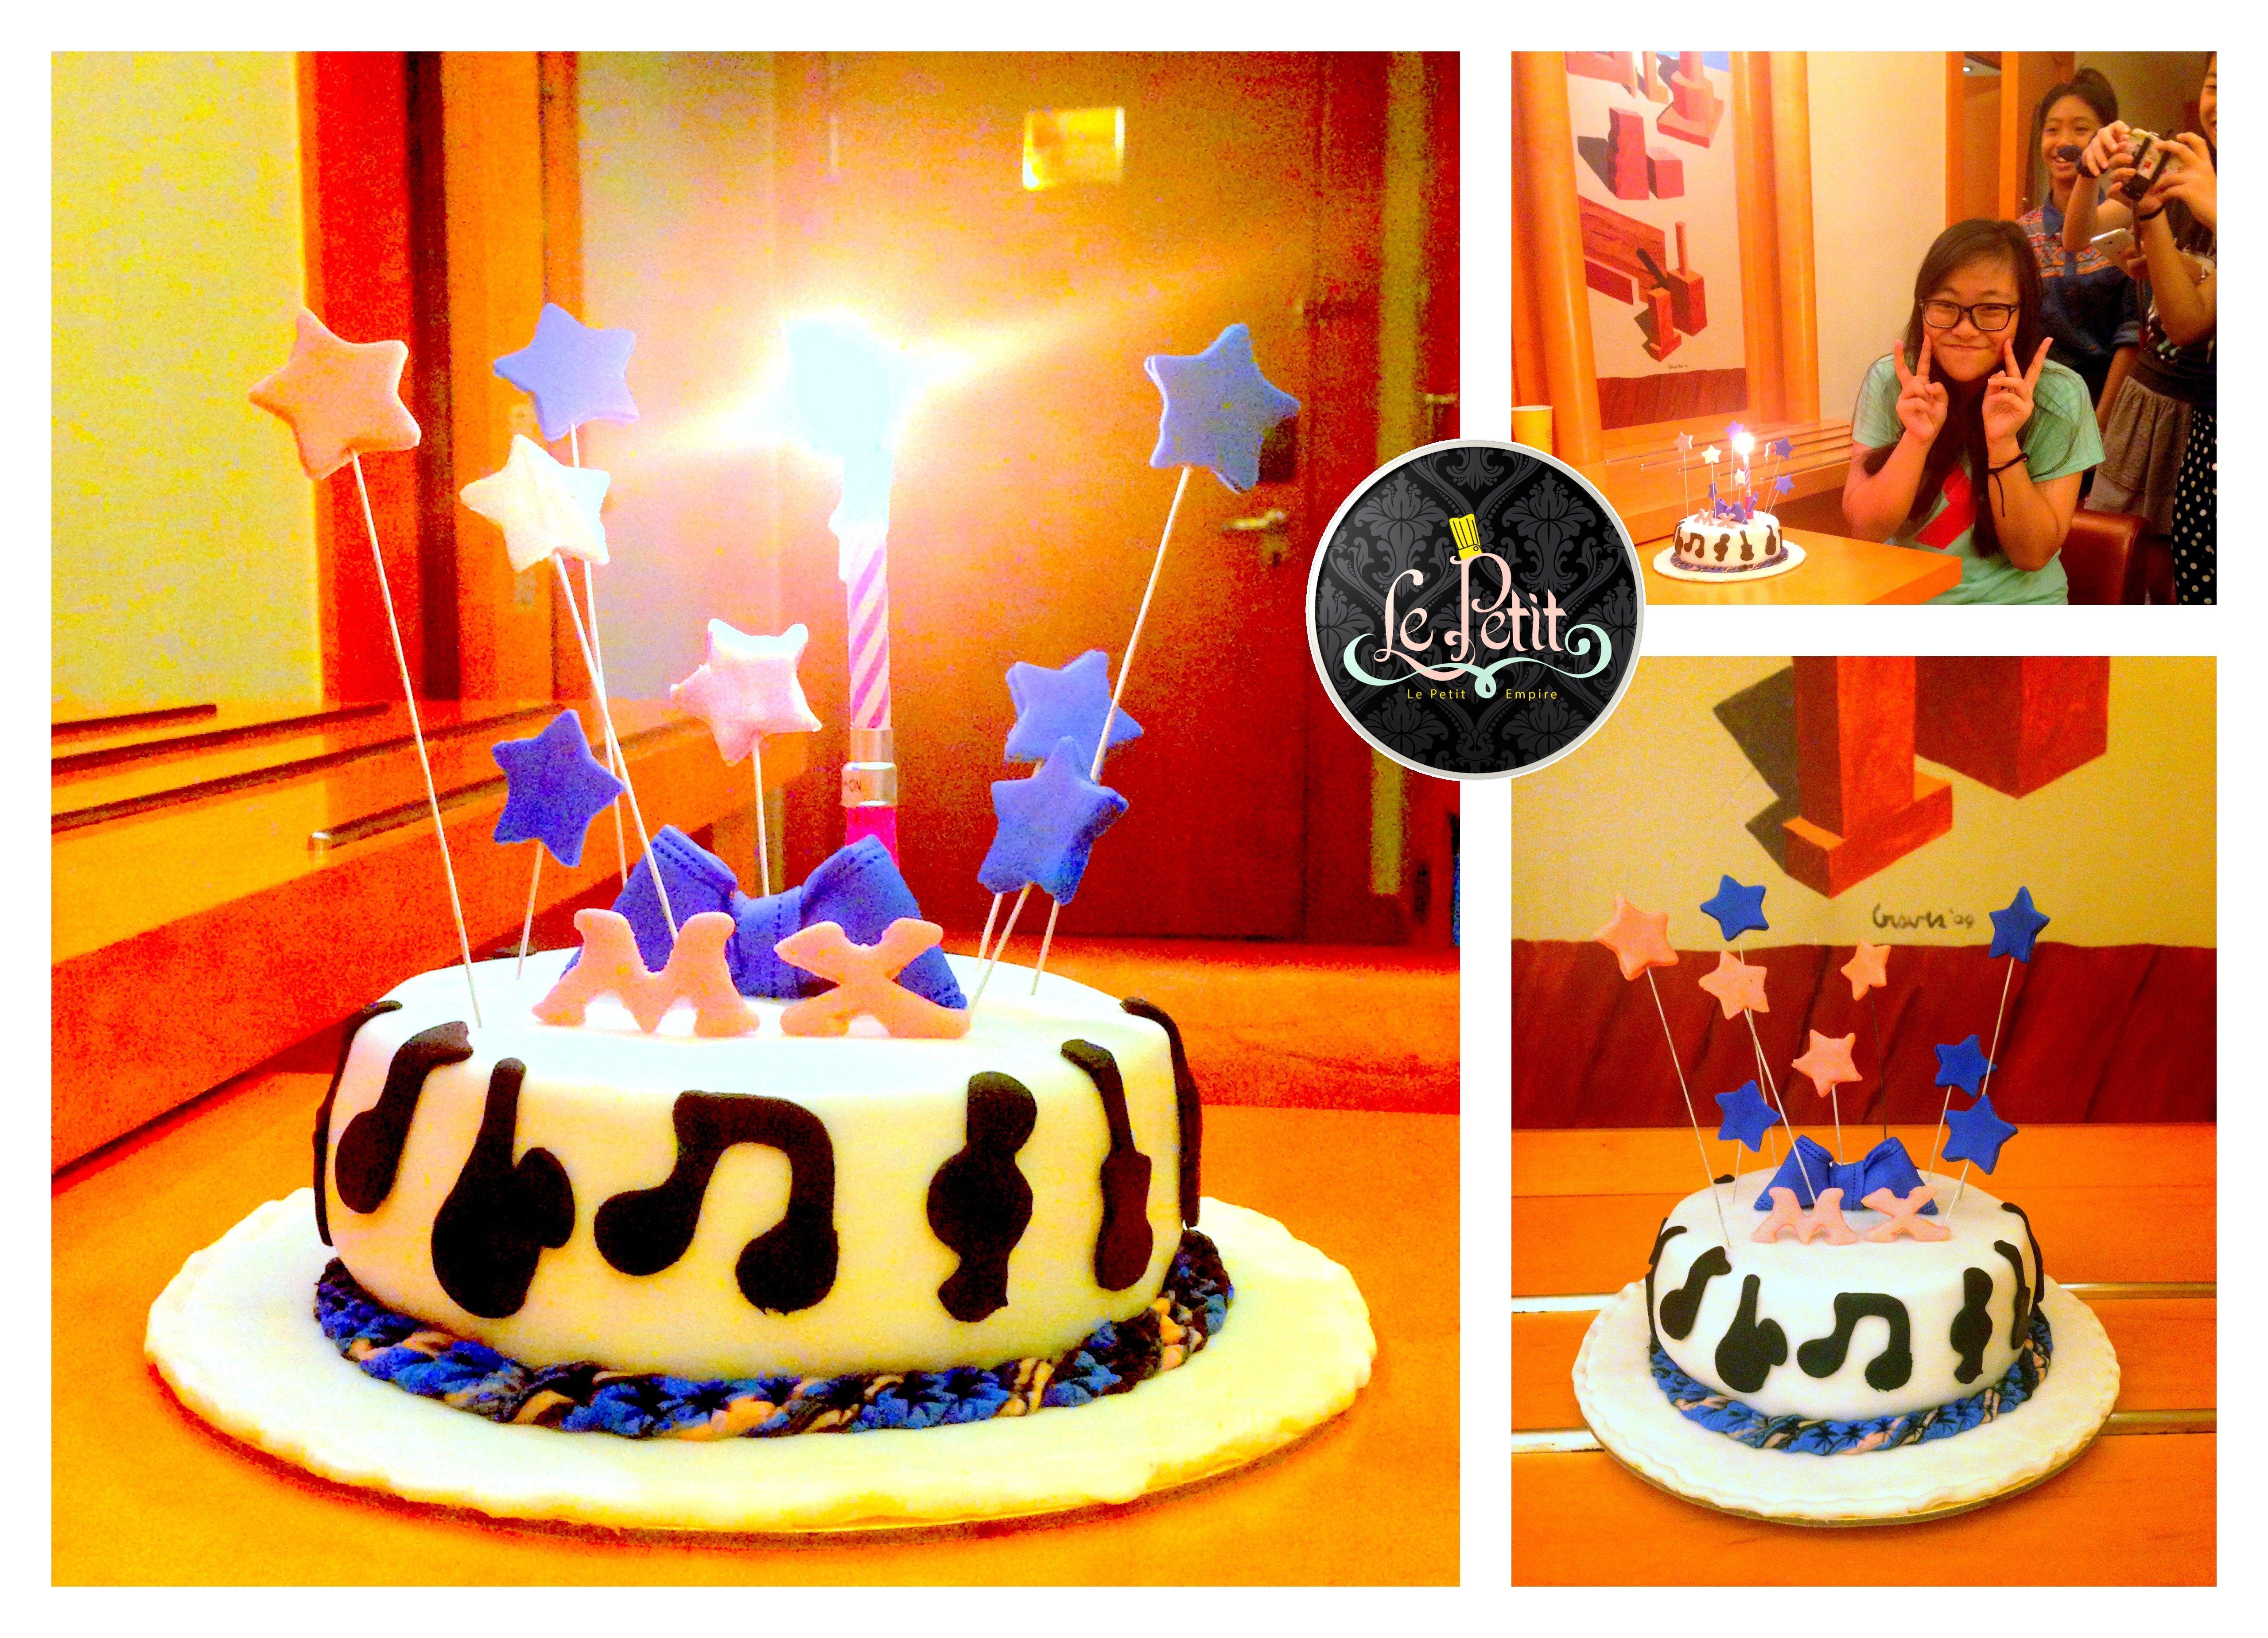 Music Fantasy Customized Cakes Fondant Sugar Paste Art Pastry Cake Bakery